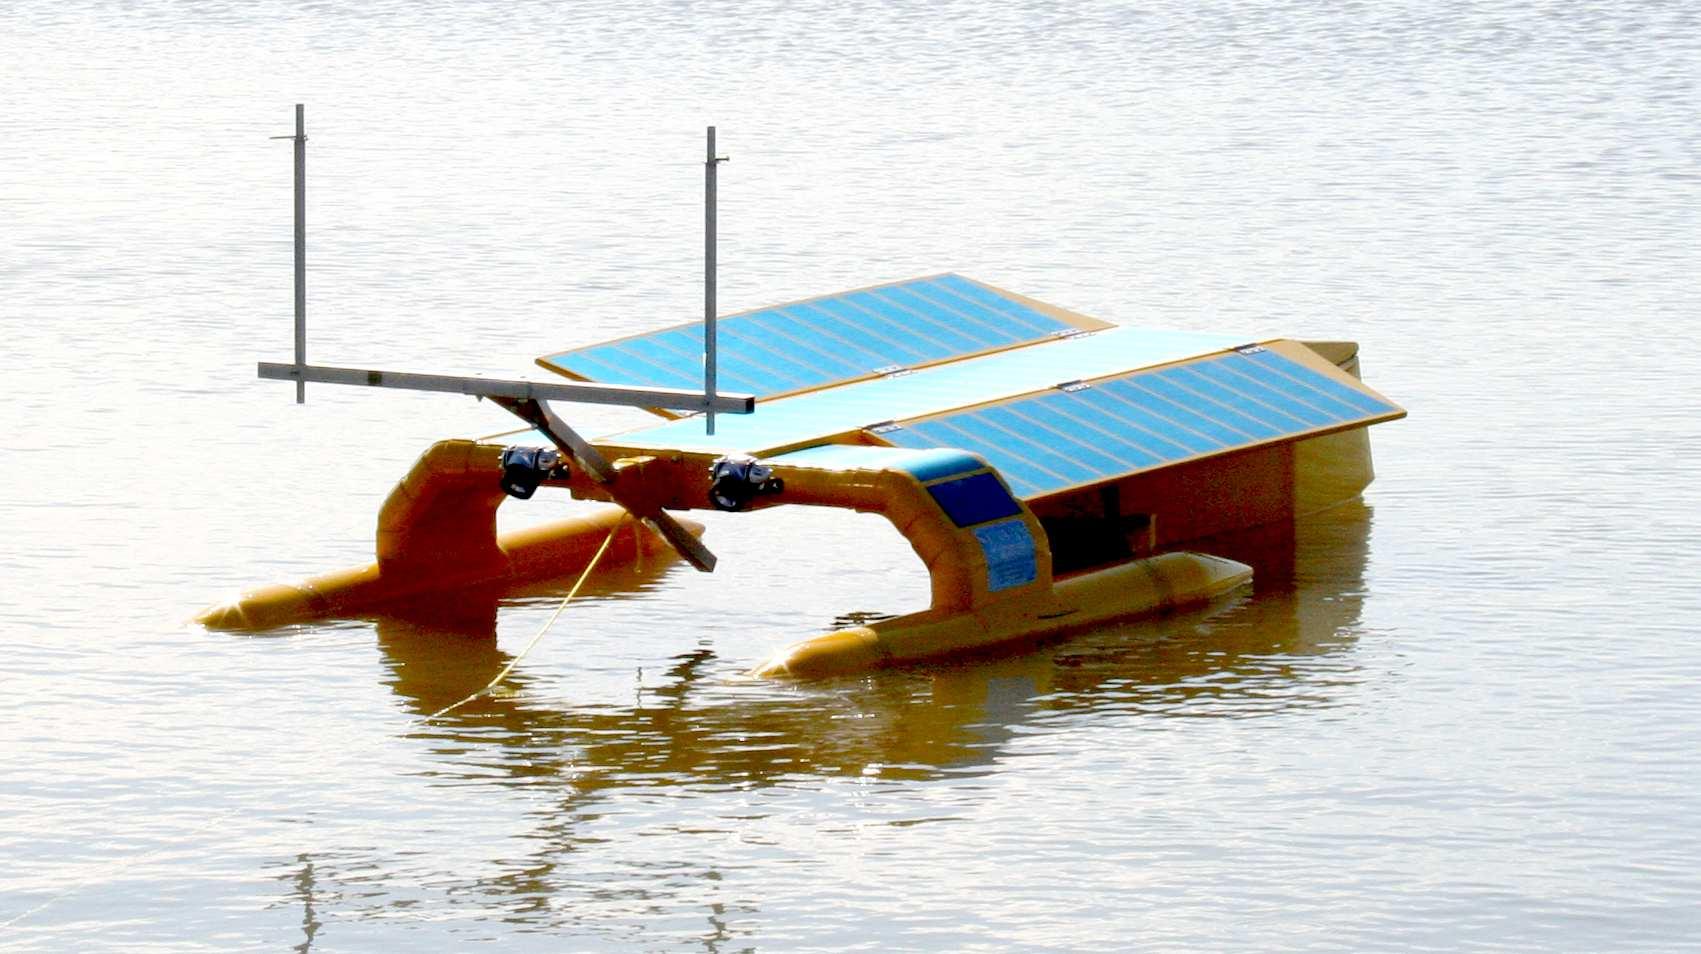 Seavax Sea Vax Robotic Ocean Plastic Oil Spill Cleaning